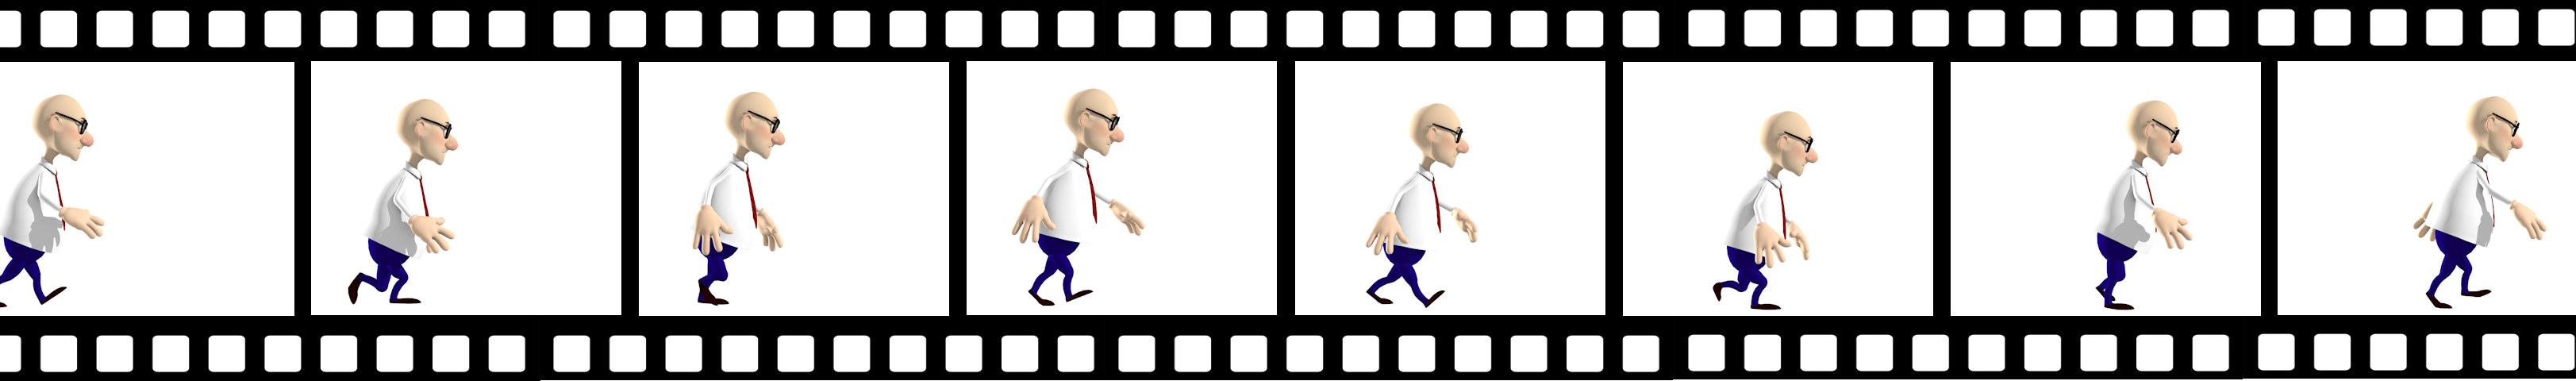 movie reel picture frame - Roho.4senses.co